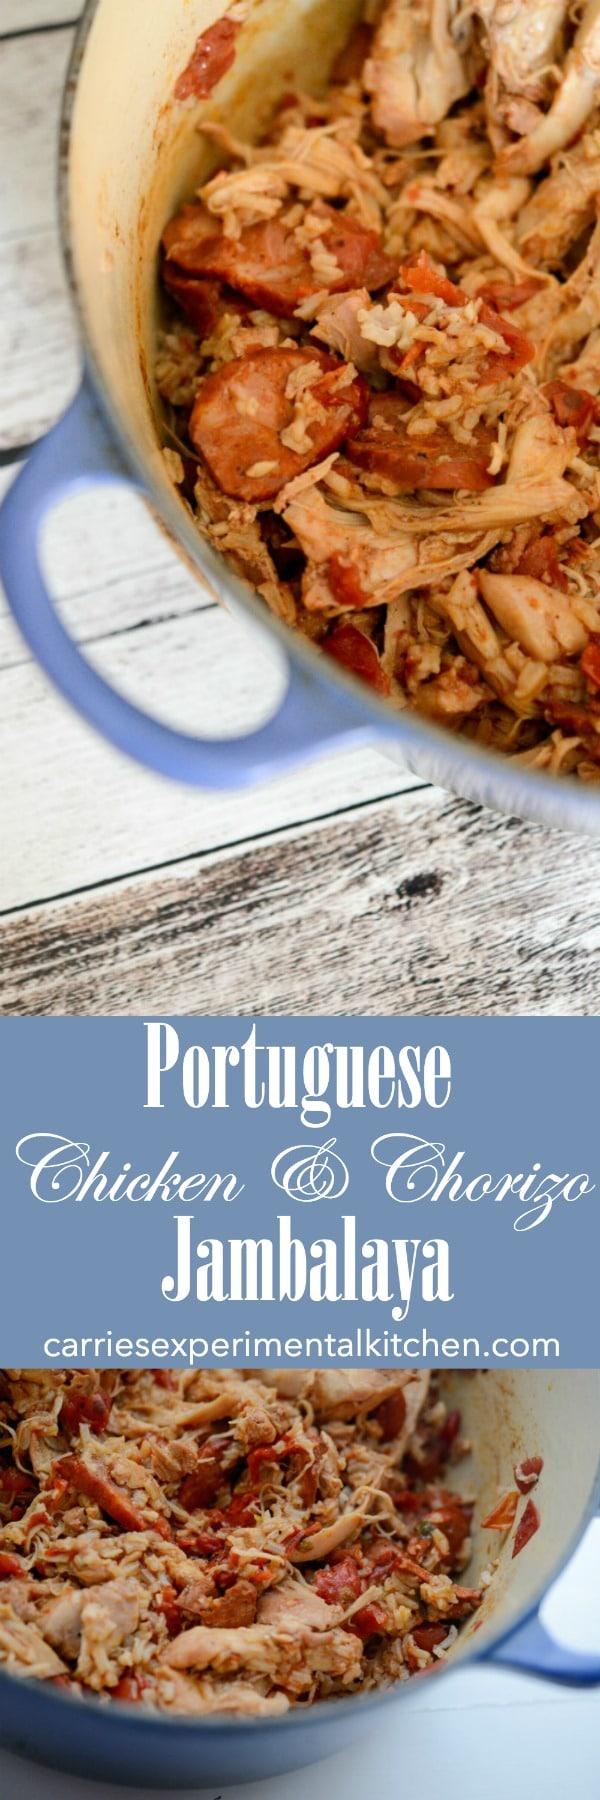 Portuguese Chicken & Chorizo Jambalaya made with boneless, skinless chicken thighs, smoked chorizo sausage, fire roasted tomatoes and long grain rice. #chorizo #chicken #portuguese #rice #jambalaya